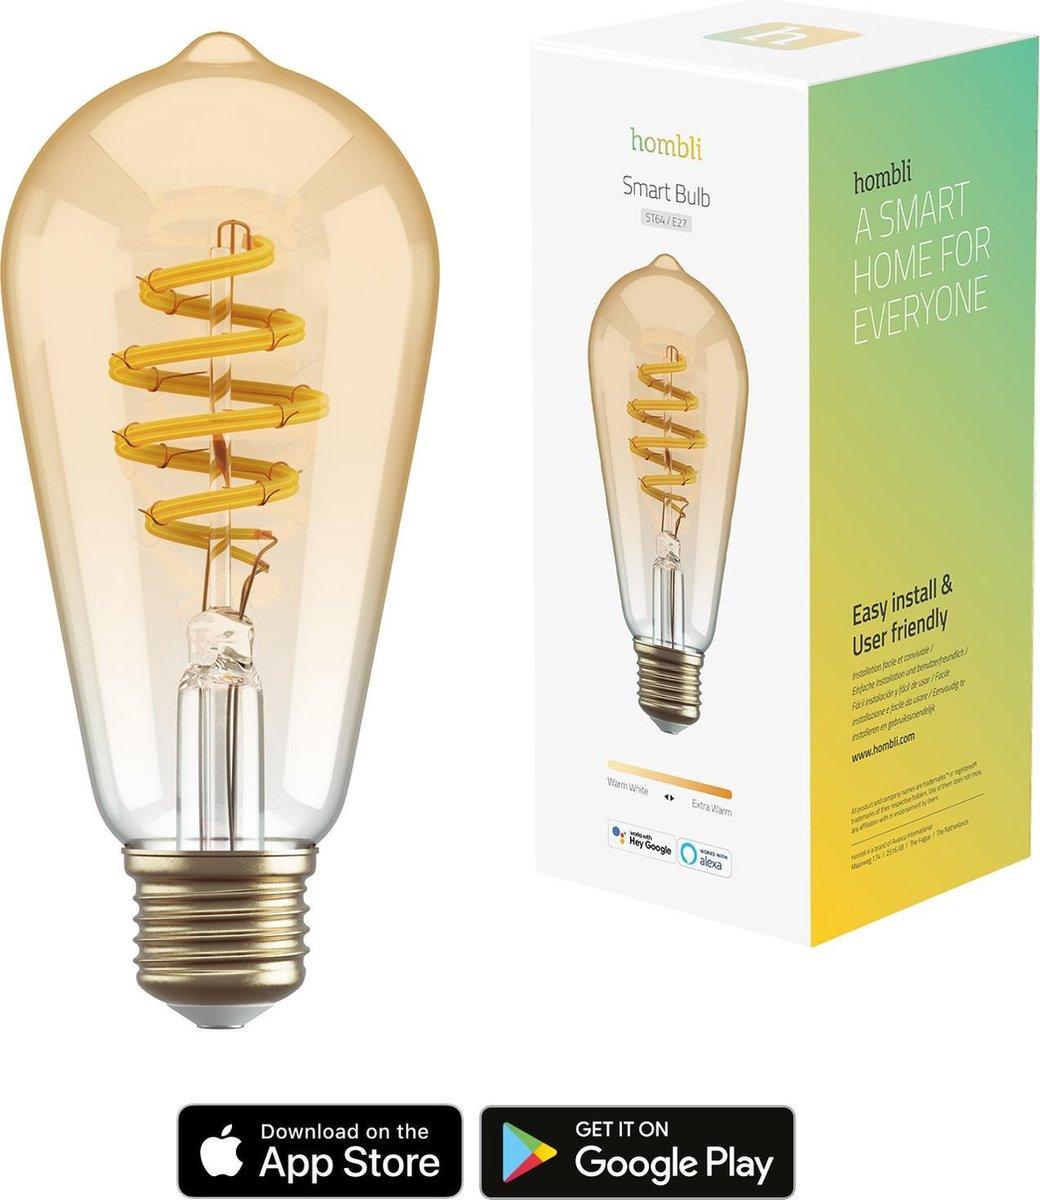 Hombli Smart Filament Bulb E27 ST64 - Amber - Edison - Warm wit licht